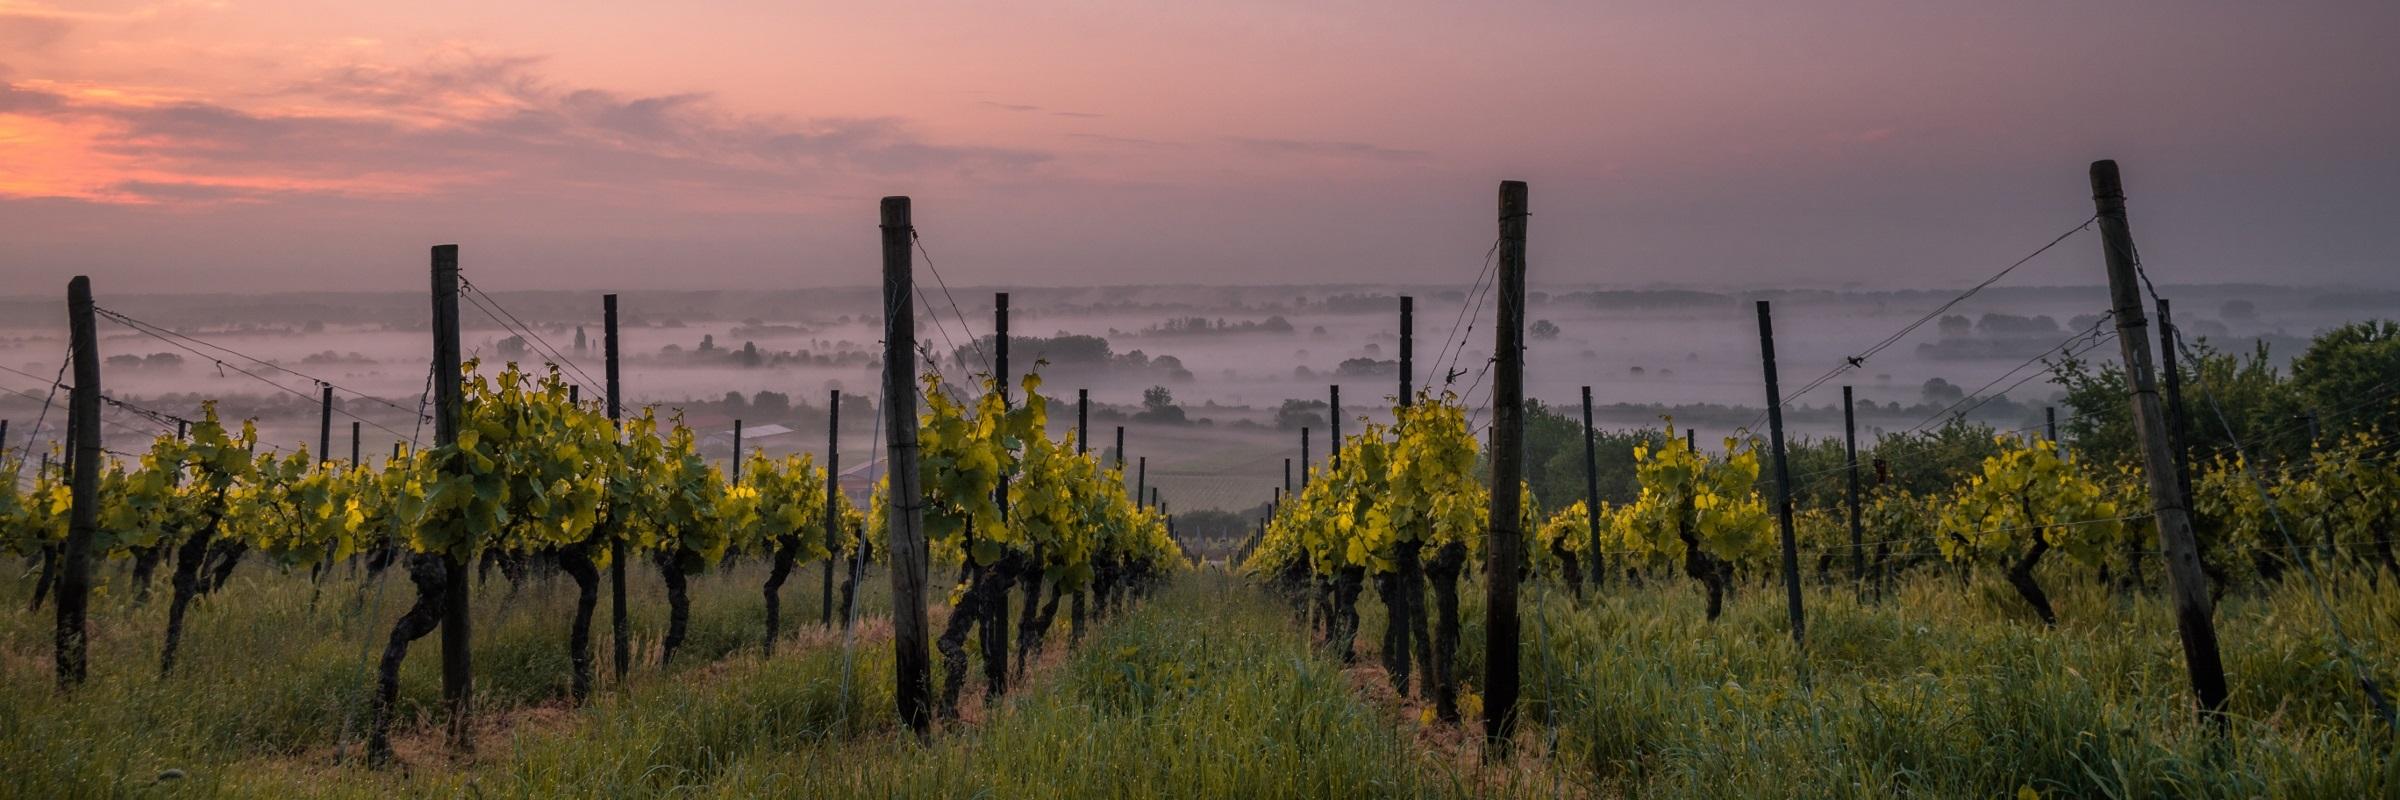 Vinyard Sunset (2400×800)